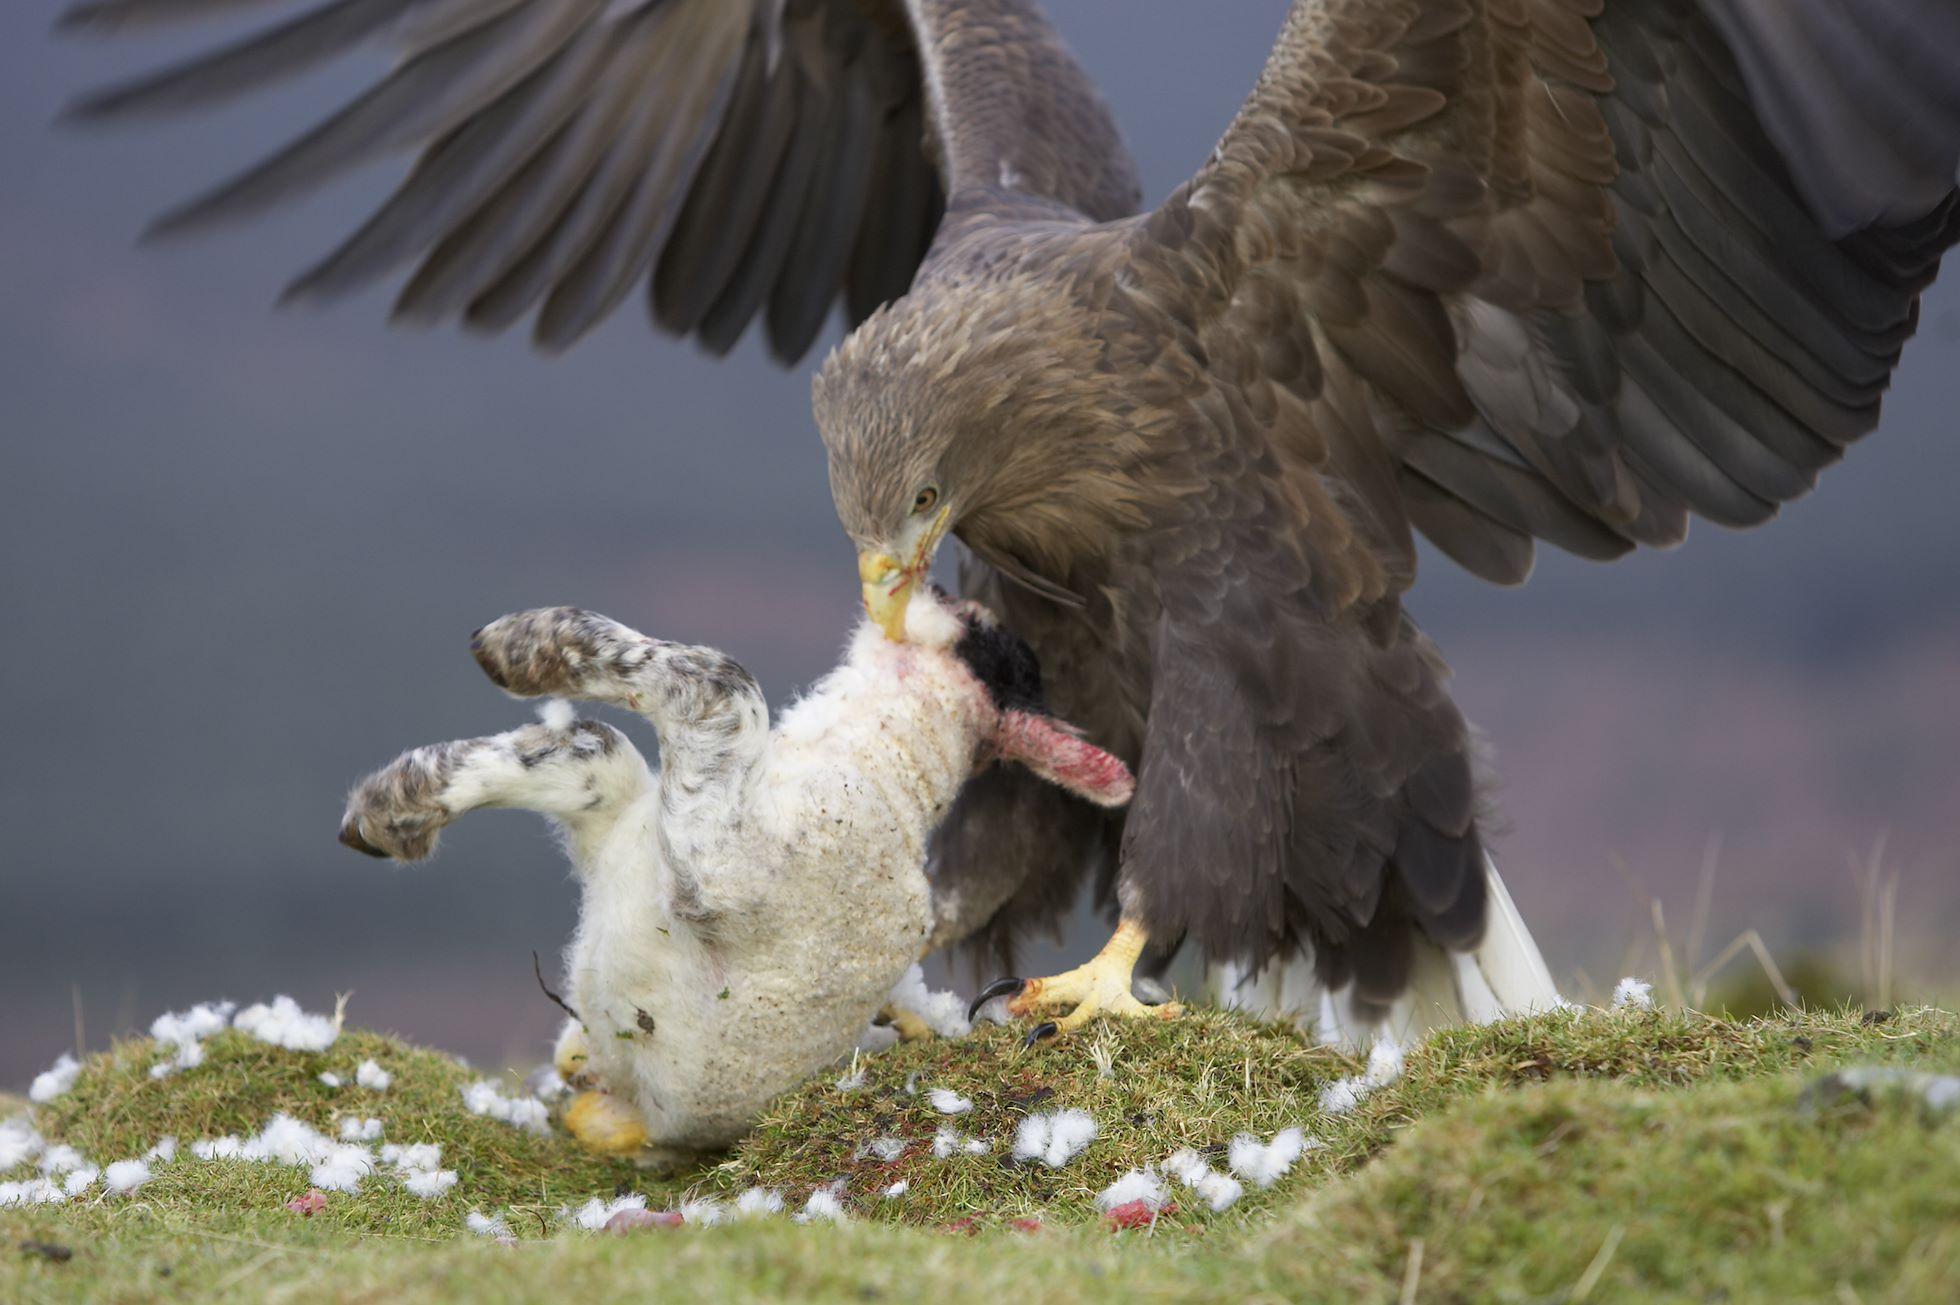 White tailed eagle (Haliaeetus albicilla) adult feeding on lamb, Mull, Argyll, Scotland (c)